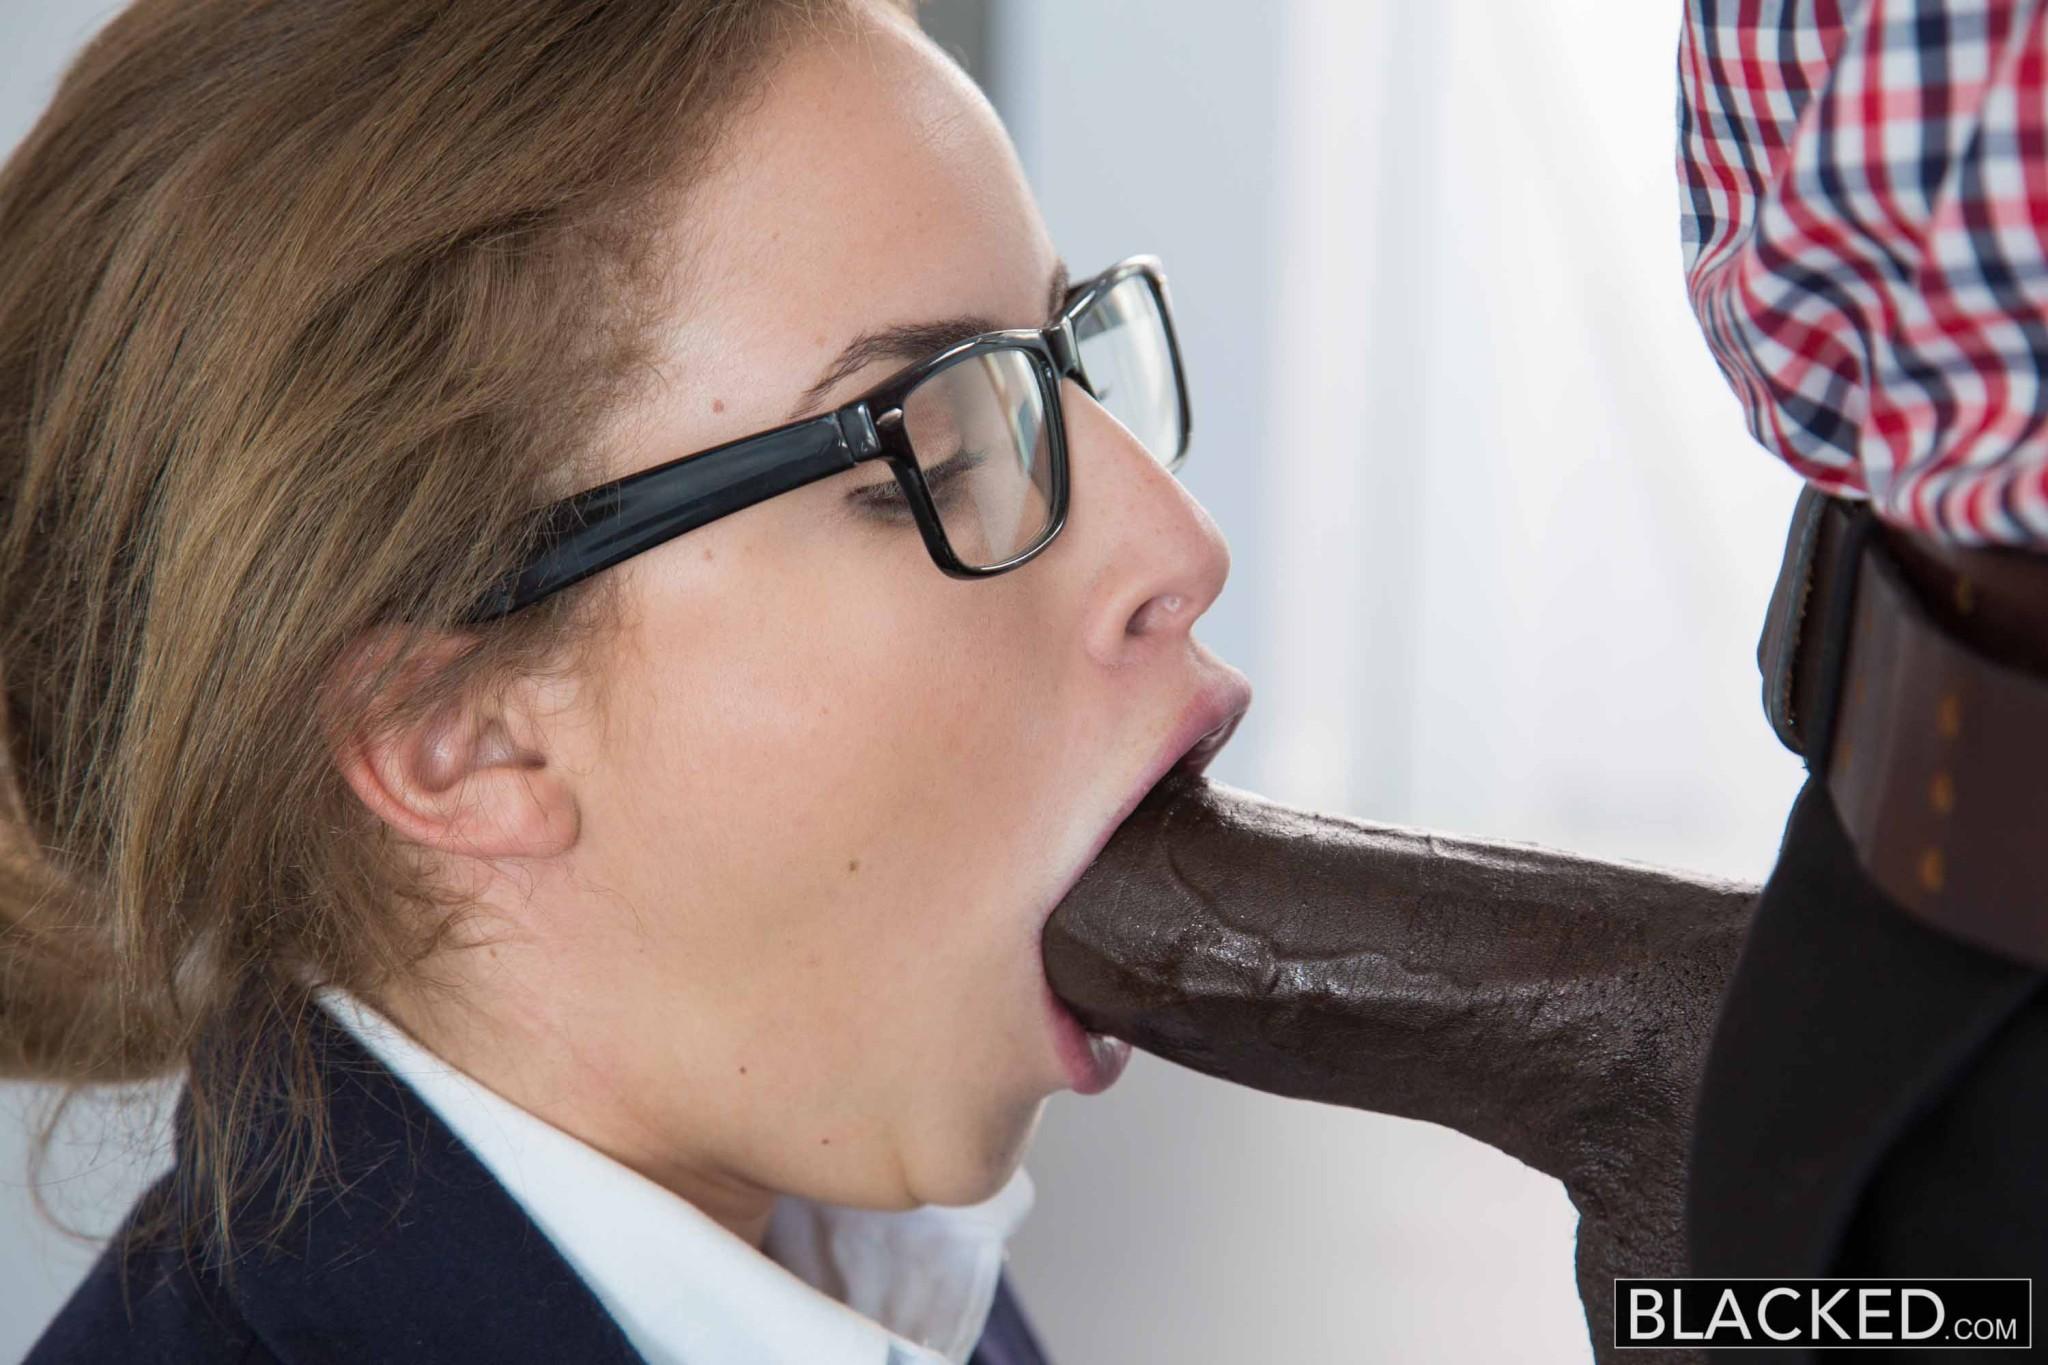 Interracial porn blowjob white female sucks bbc